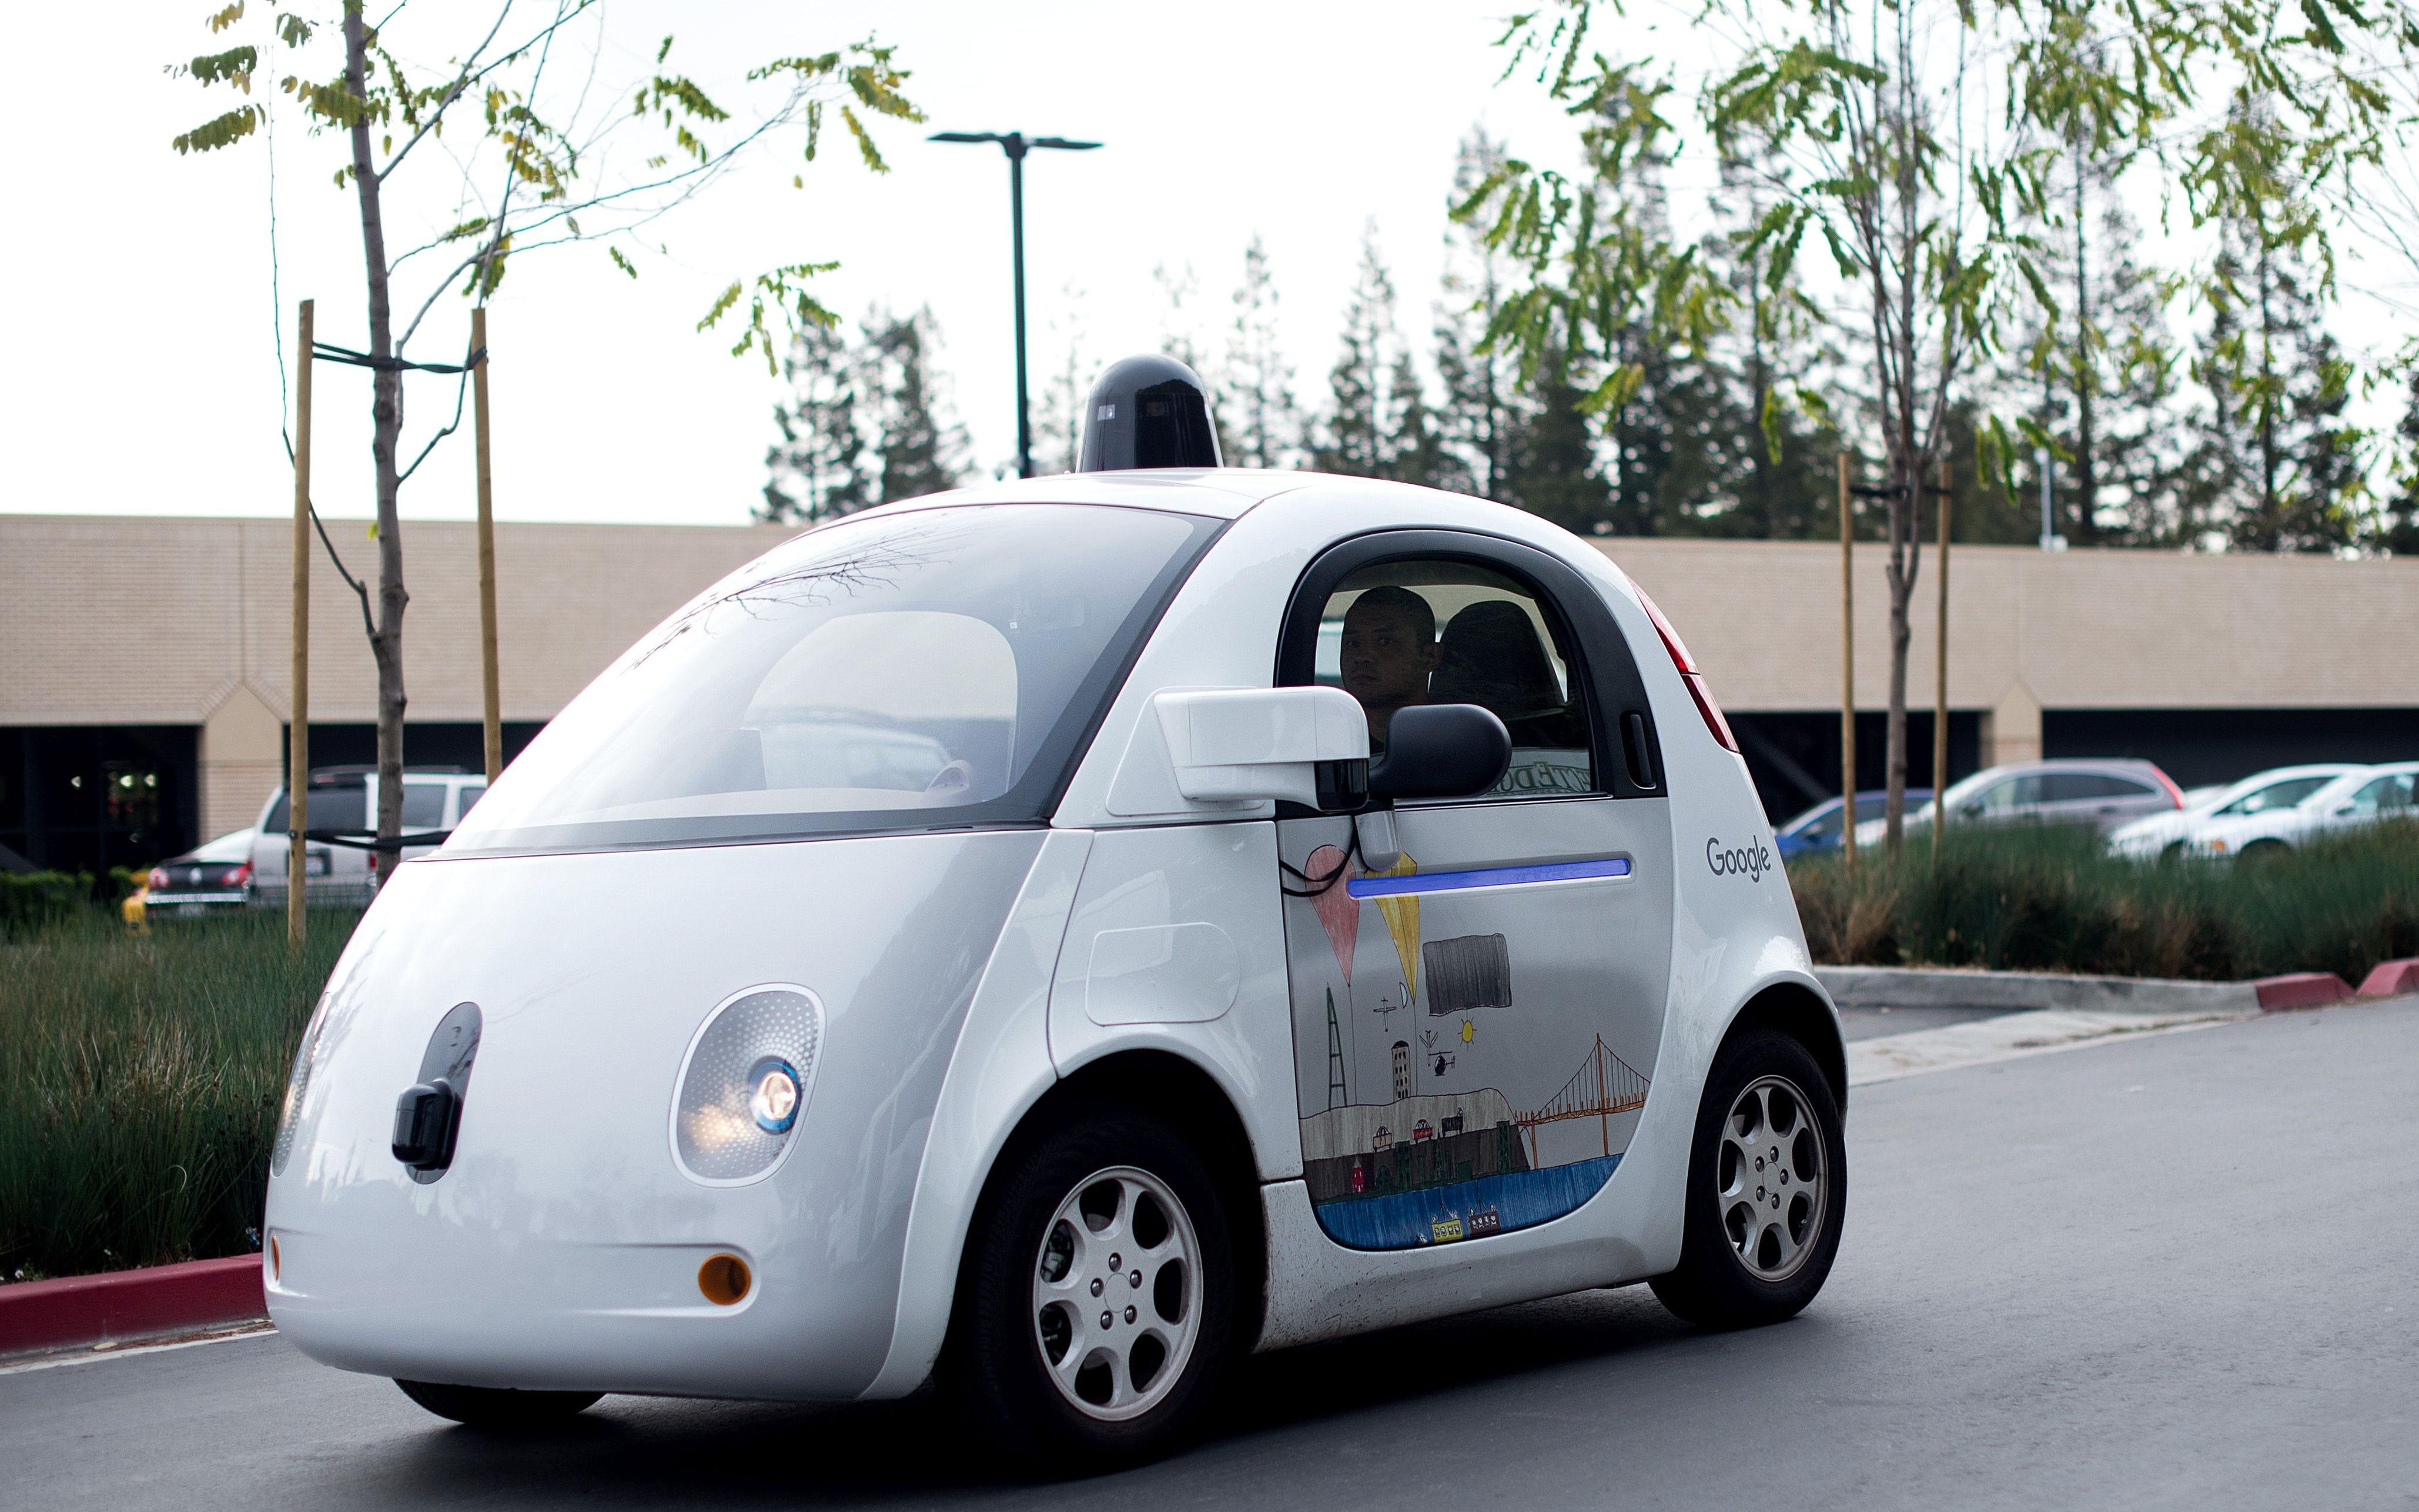 UK startup raises millions for driverless parking system